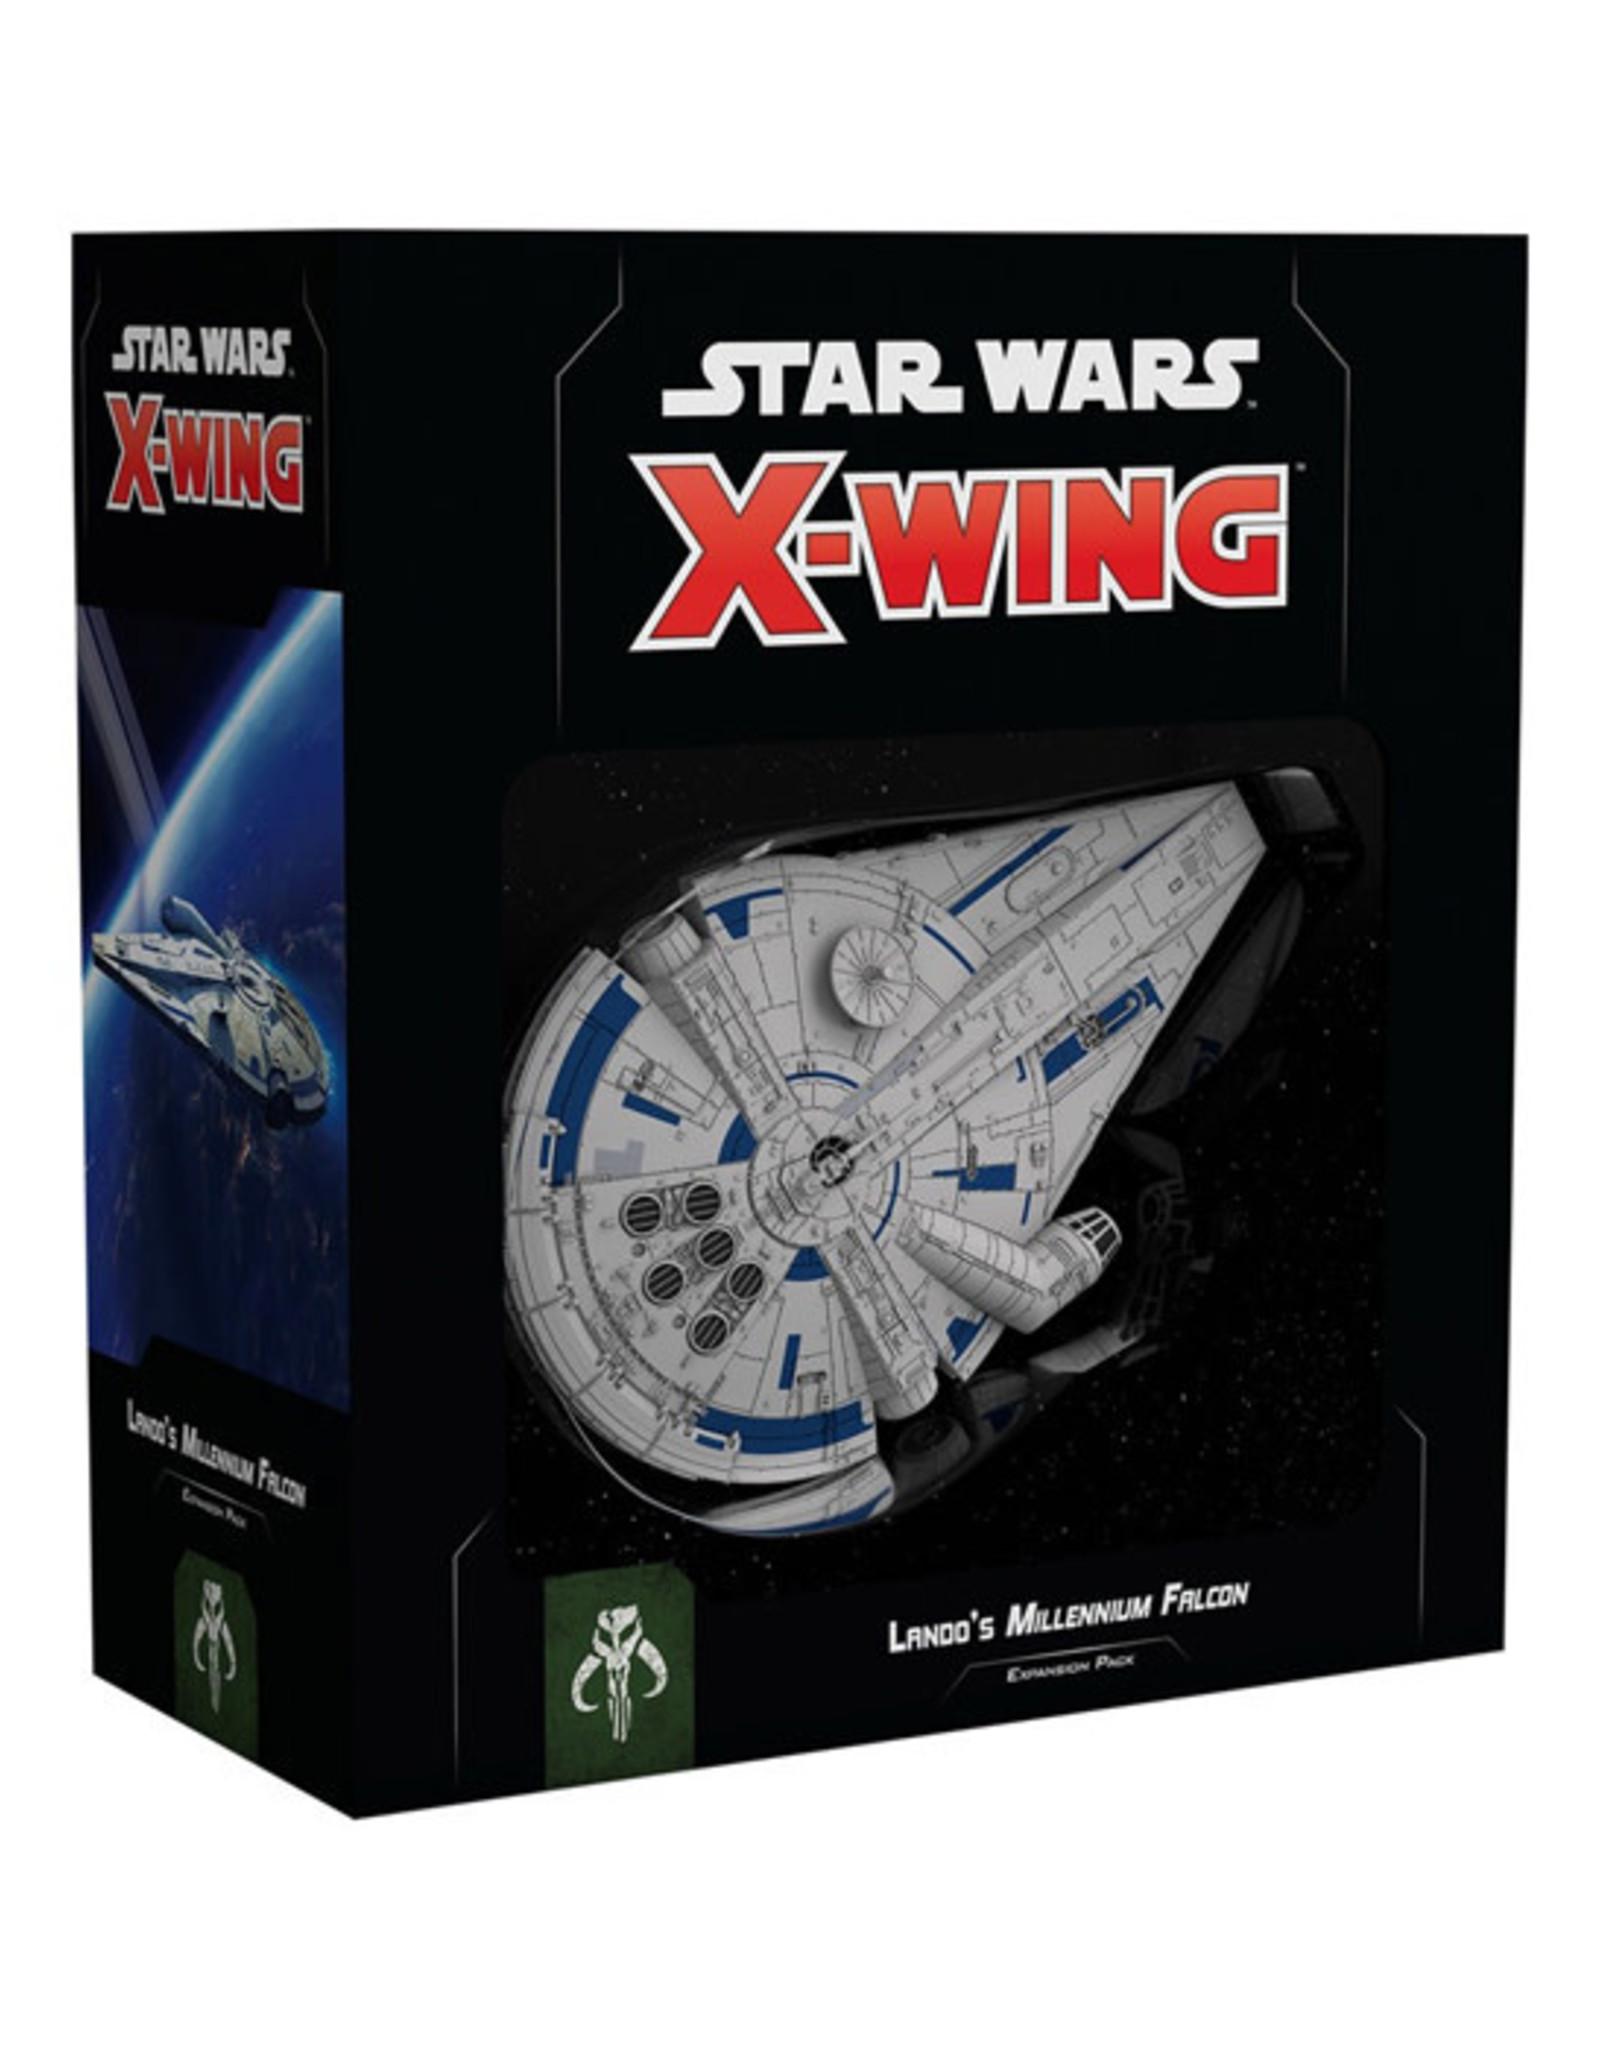 Fantasy Flight Games Star Wars: X-Wing - 2nd Edition - Lando's Millennium Falcon